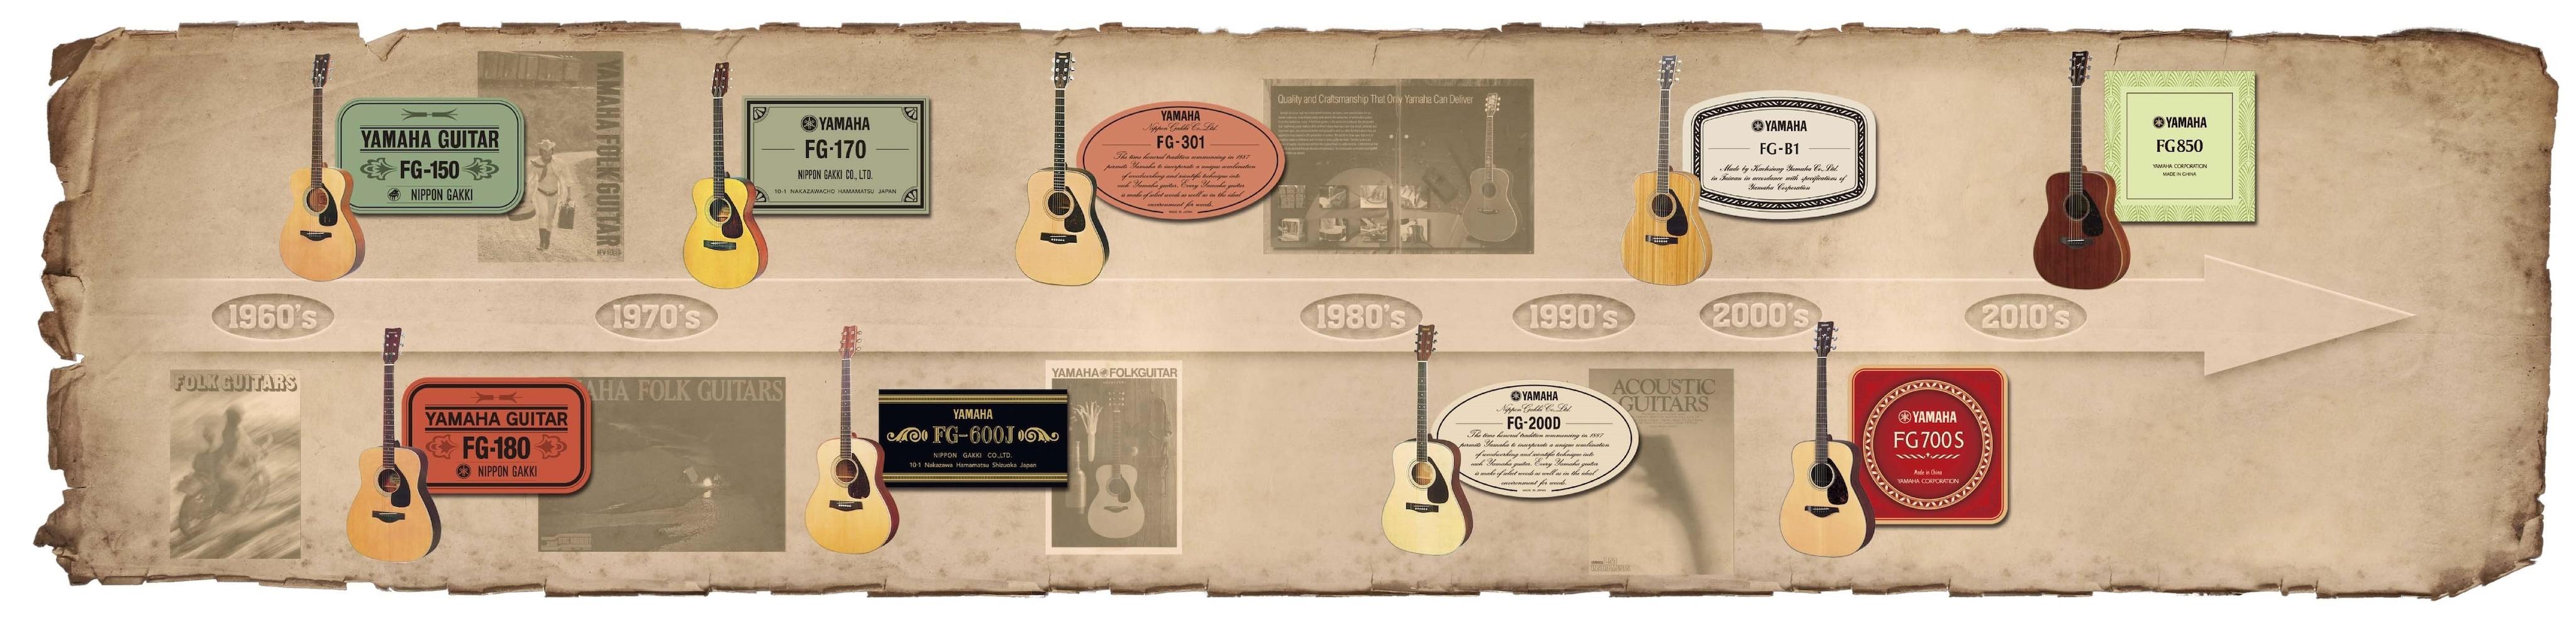 Yamaha Music History